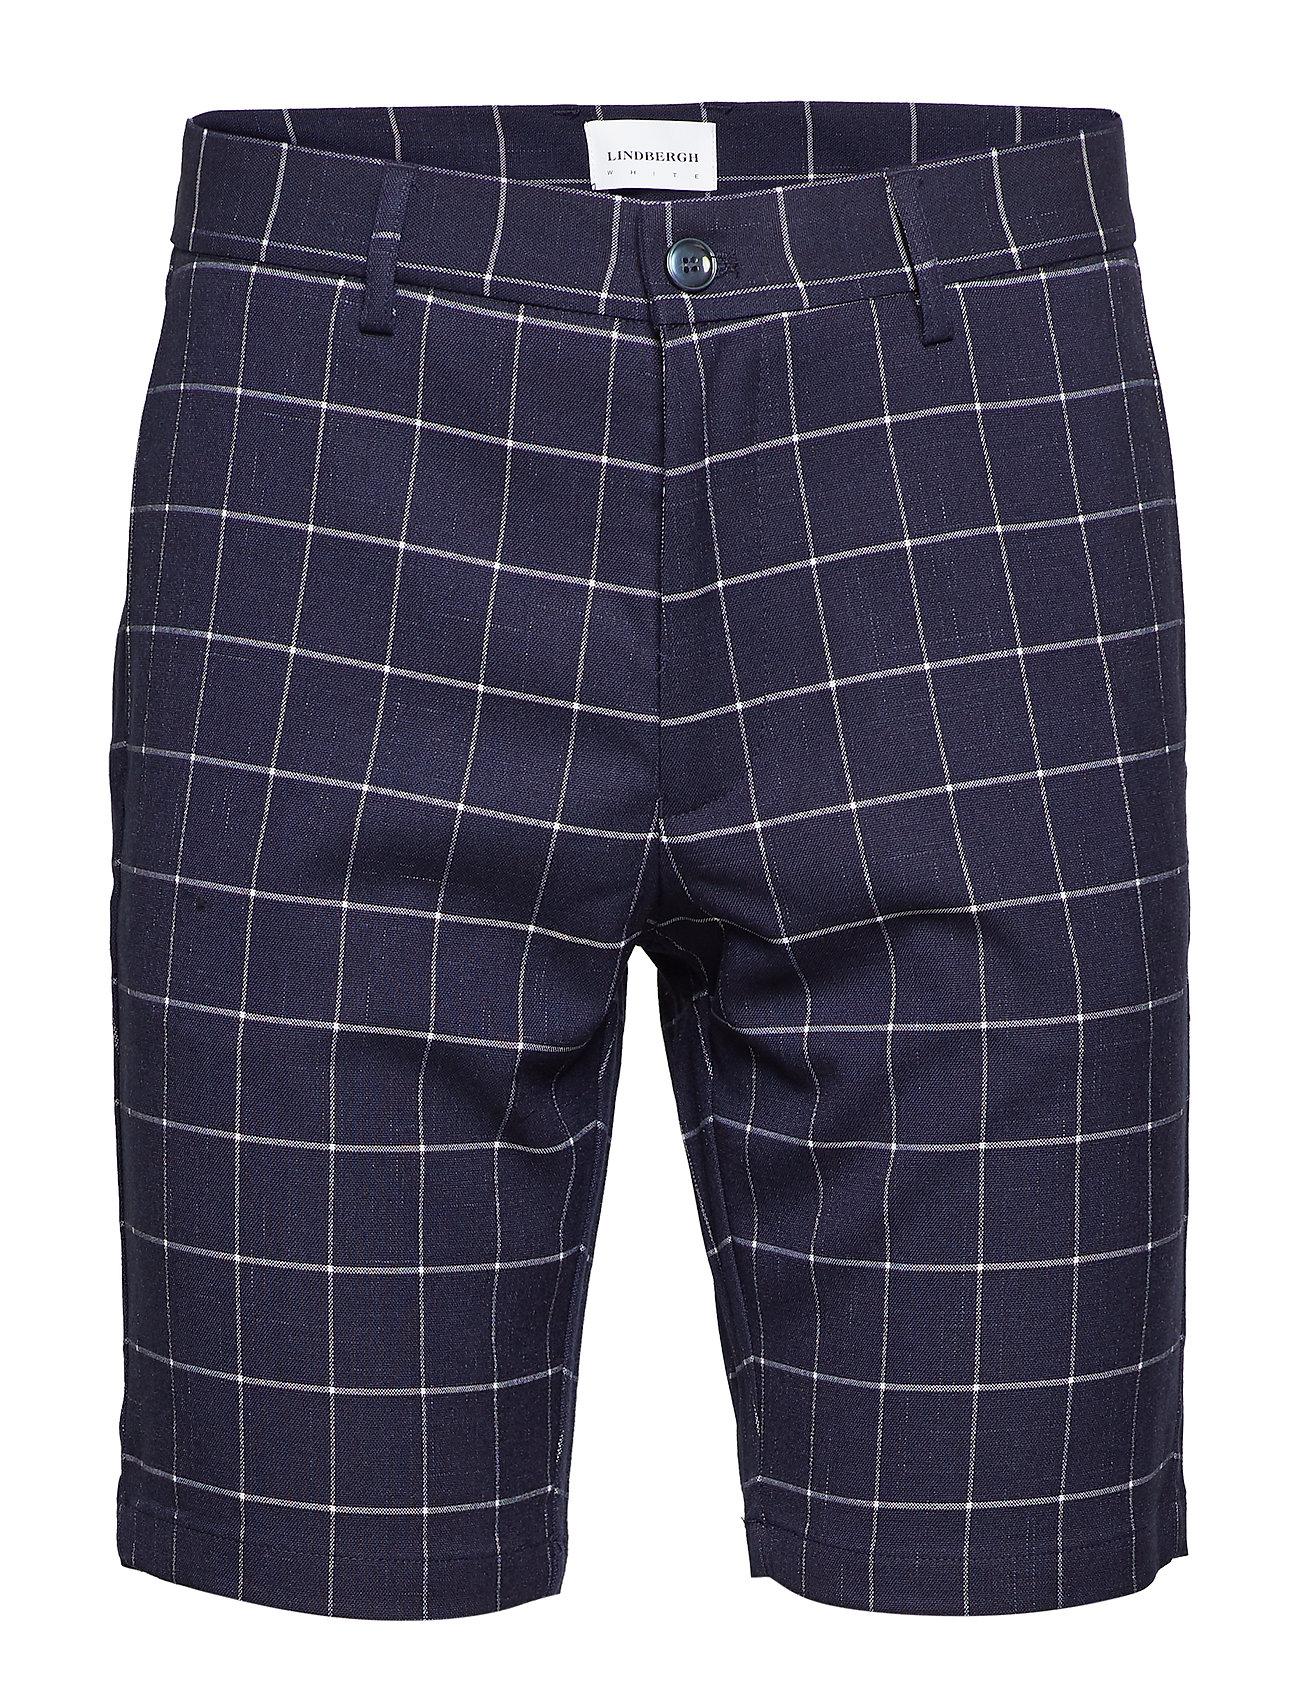 Lindbergh Checked shorts - DK BLUE